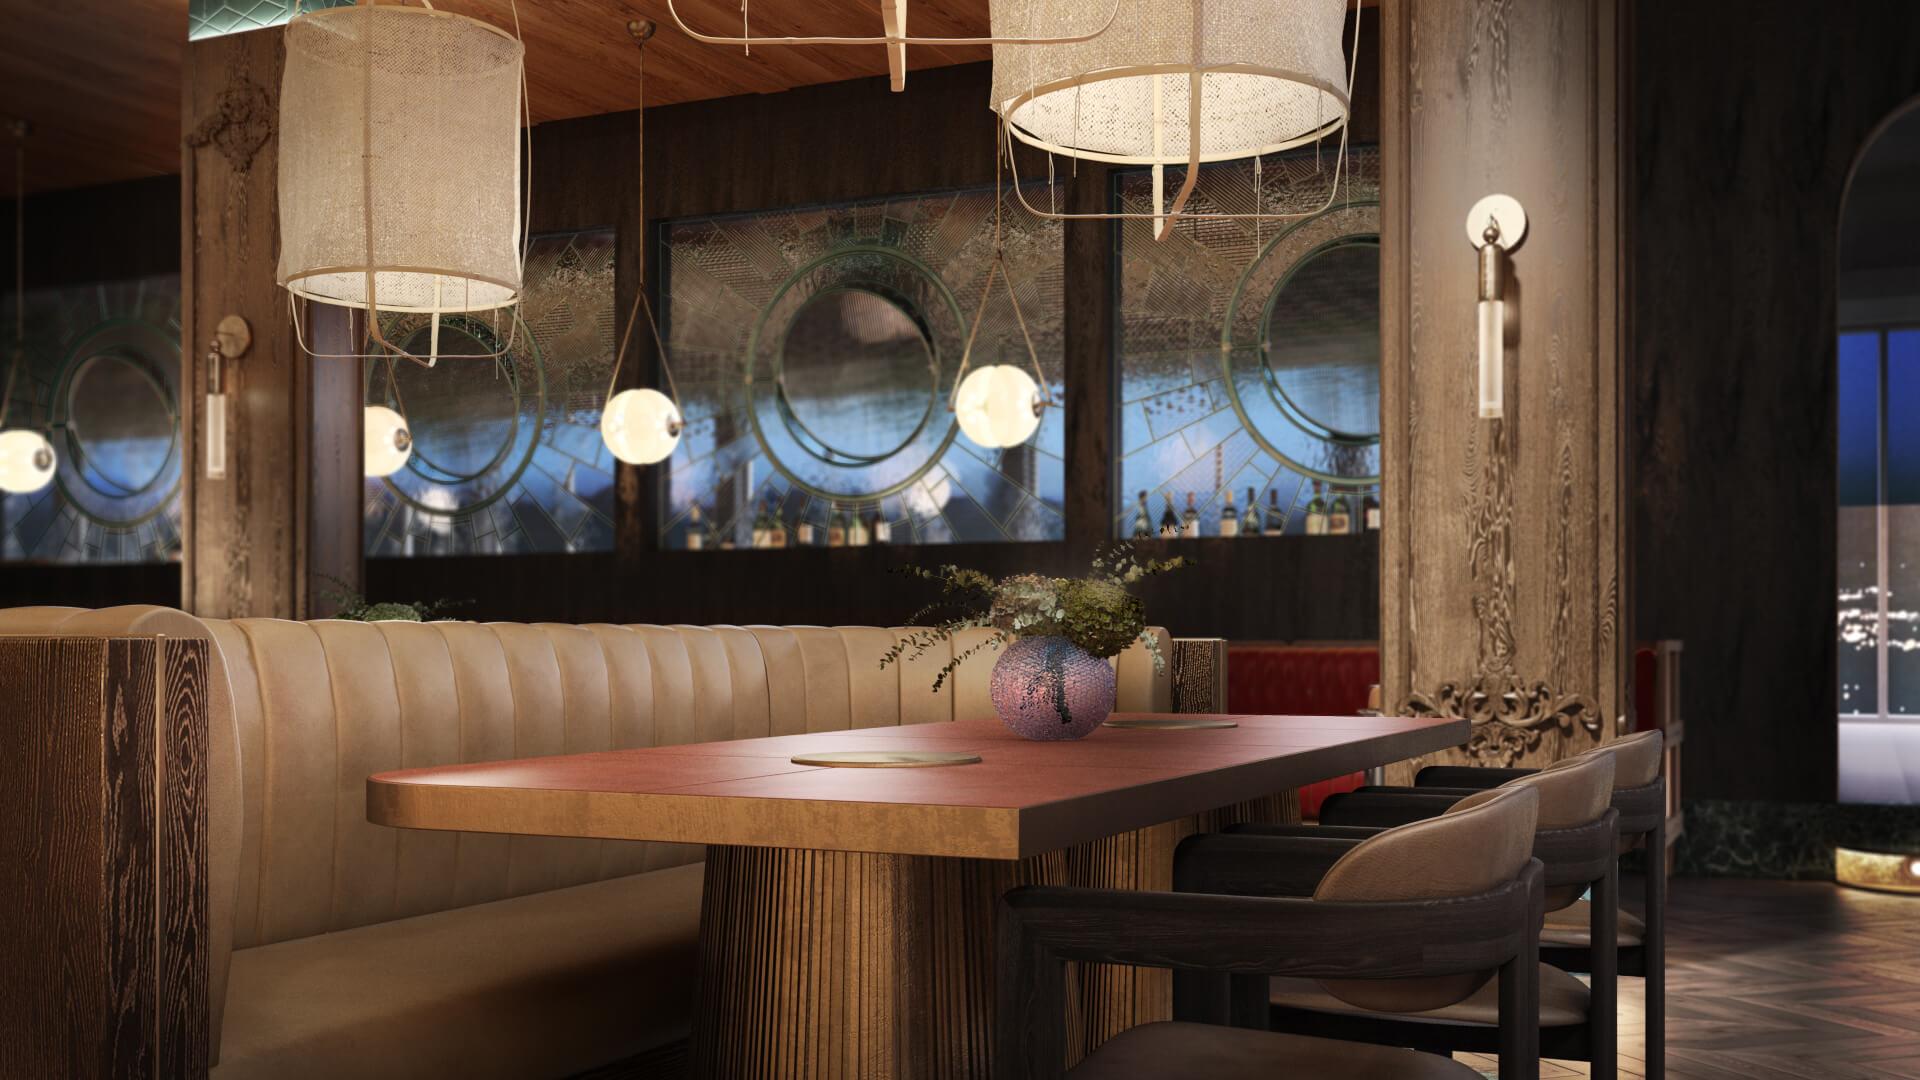 Preliminary Restaurant 3D Rendering Results